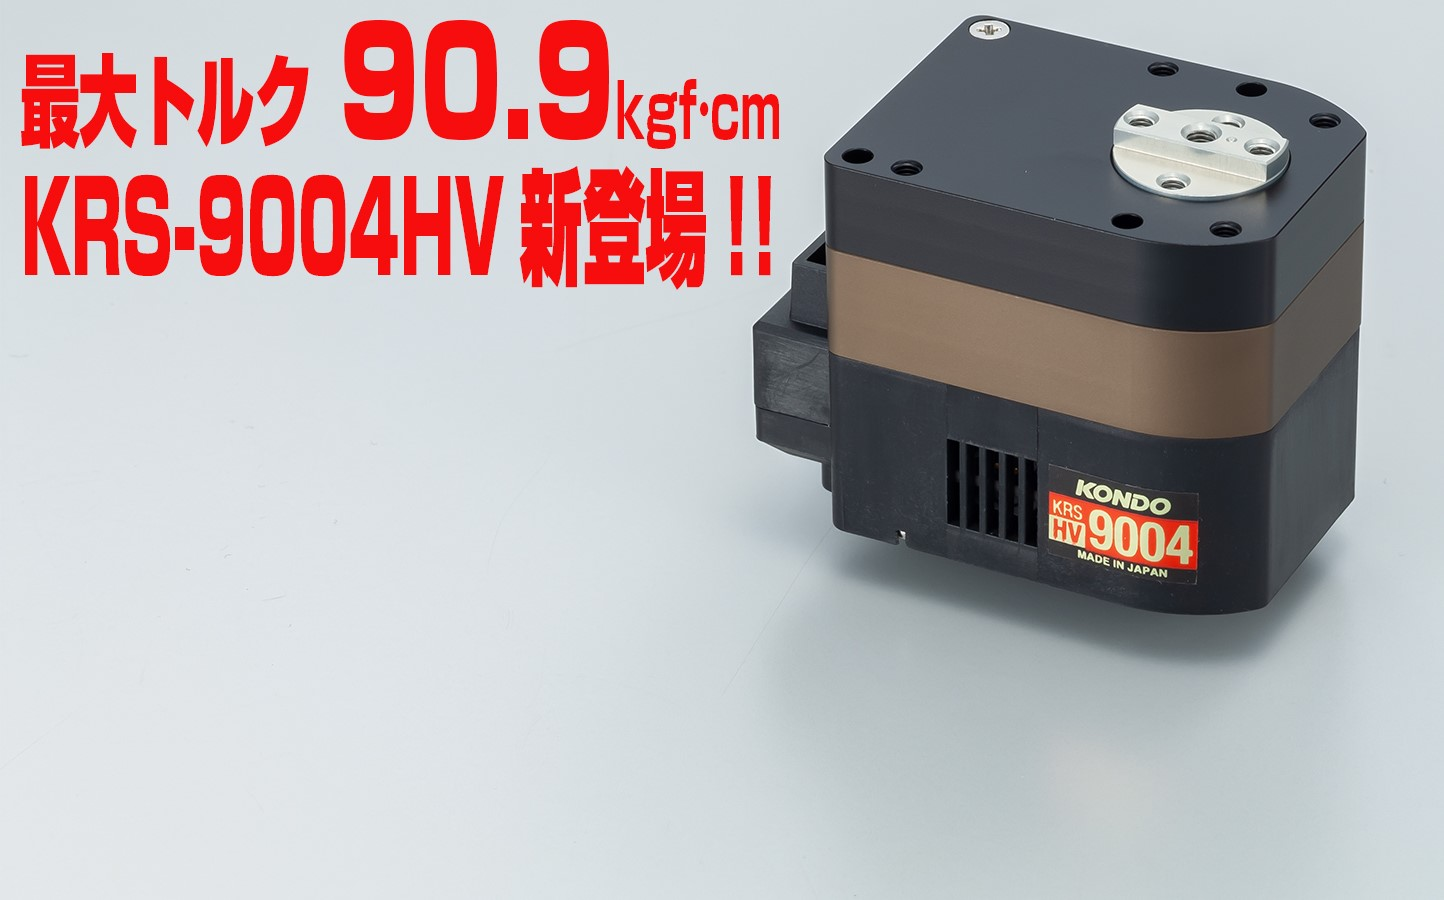 KRS-9004HV ICS